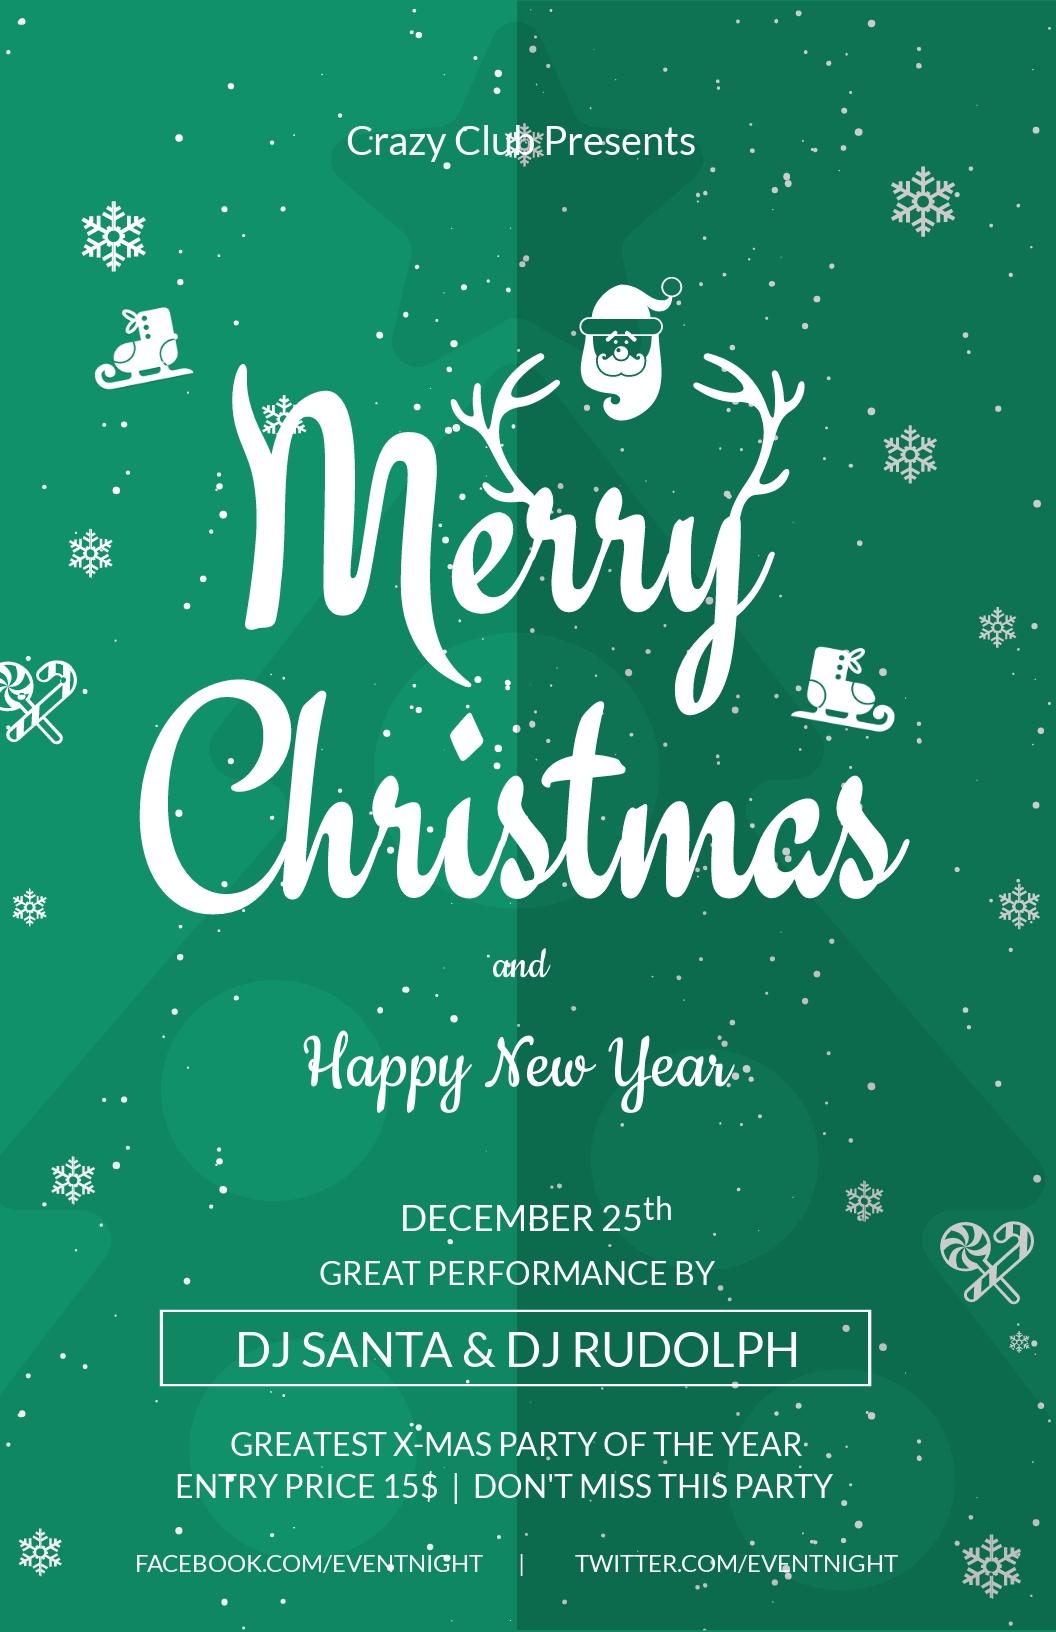 Christmas Club Poster Template